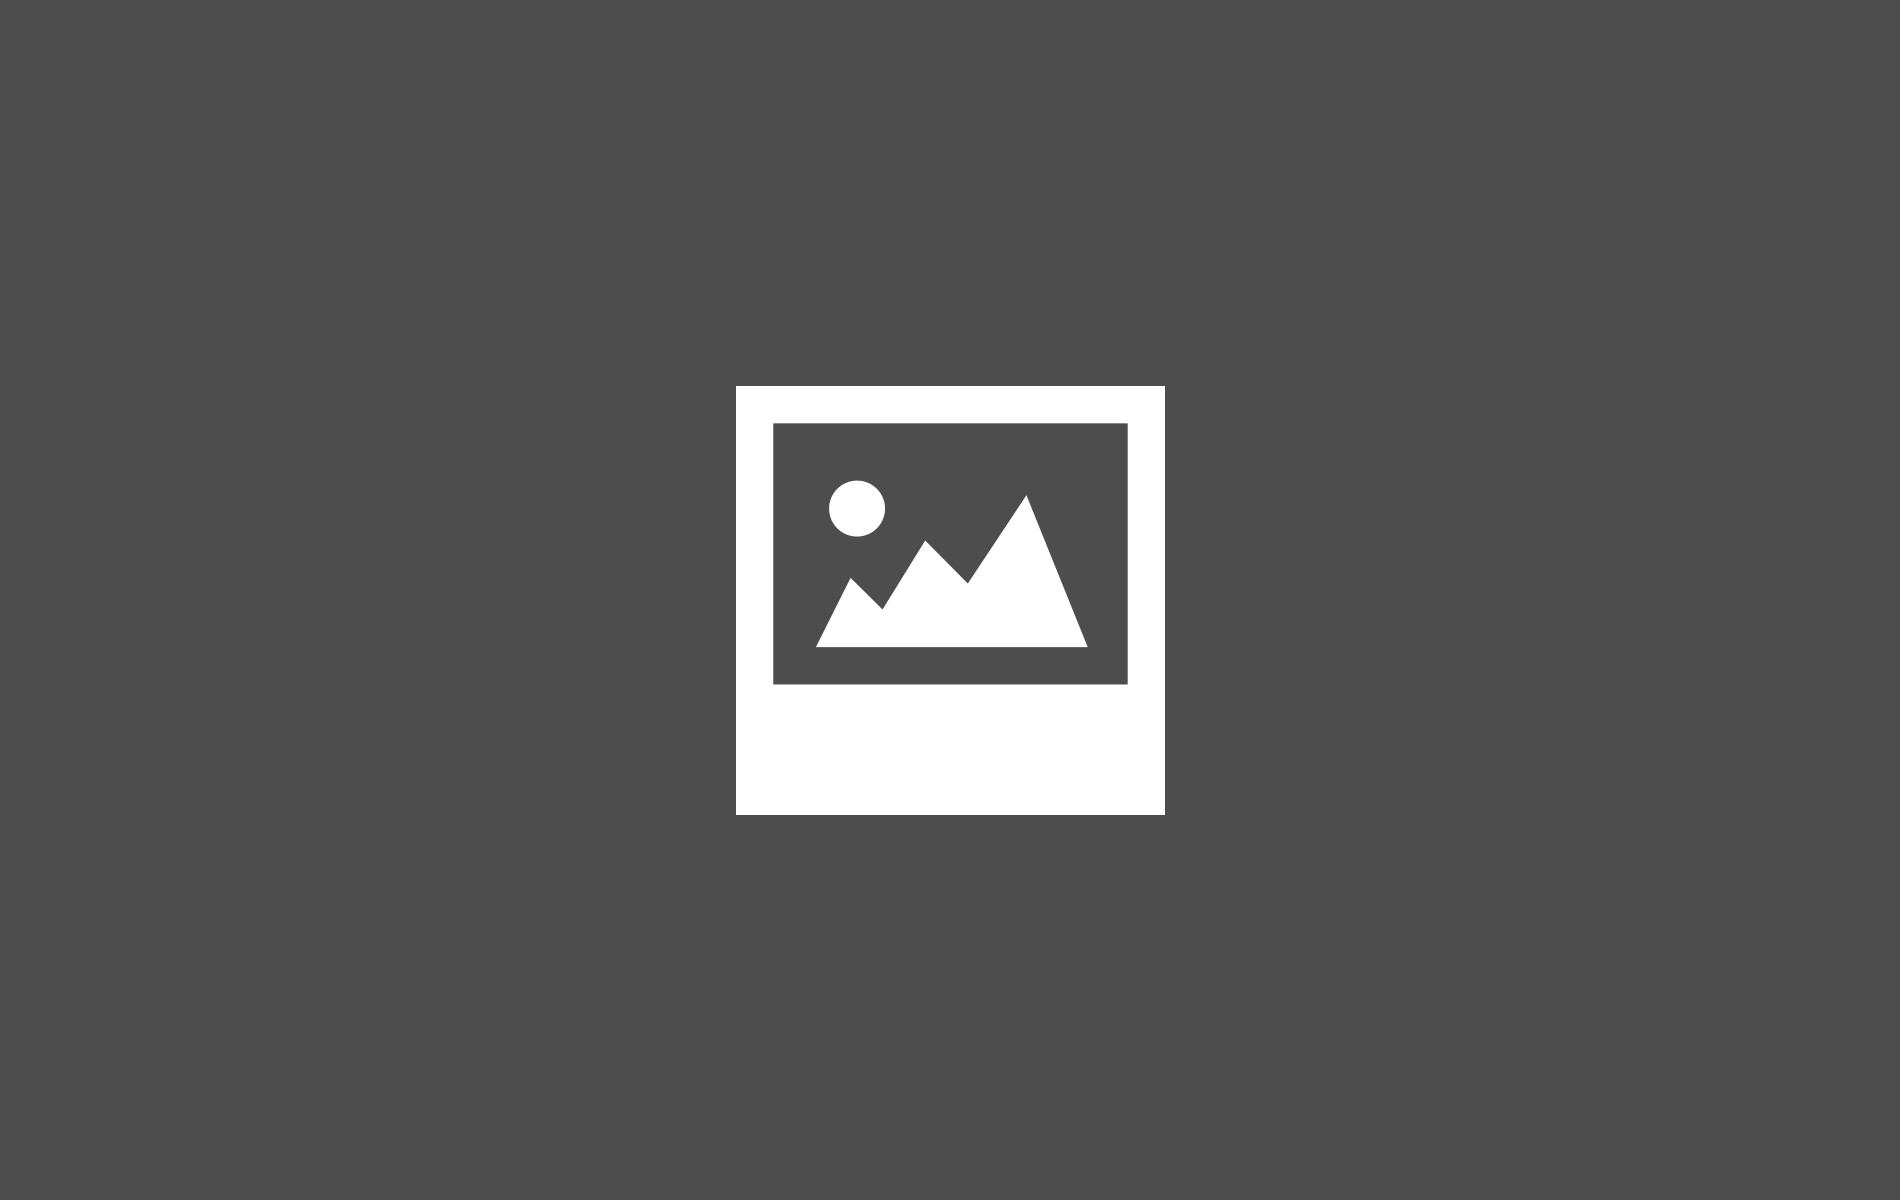 placeholder_image1